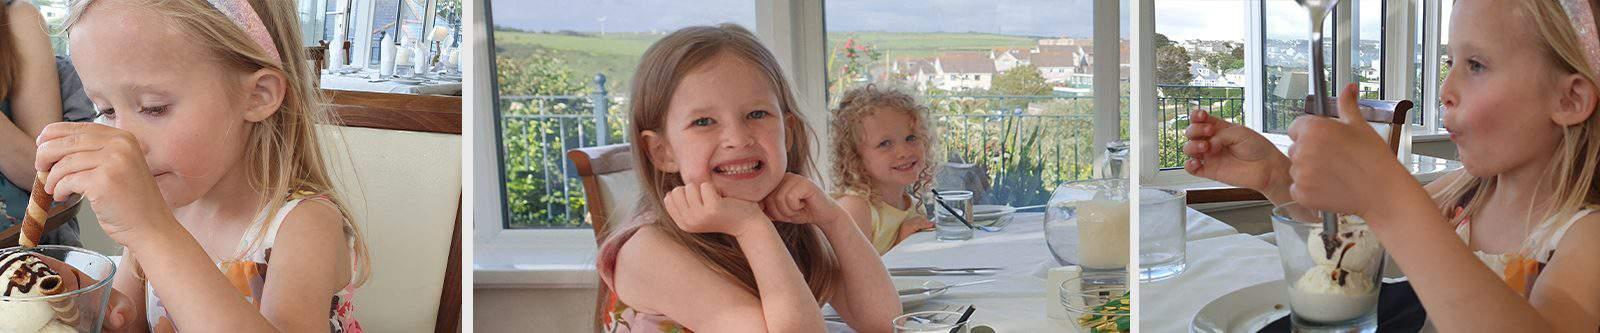 girls eating at Porth Veor Manor